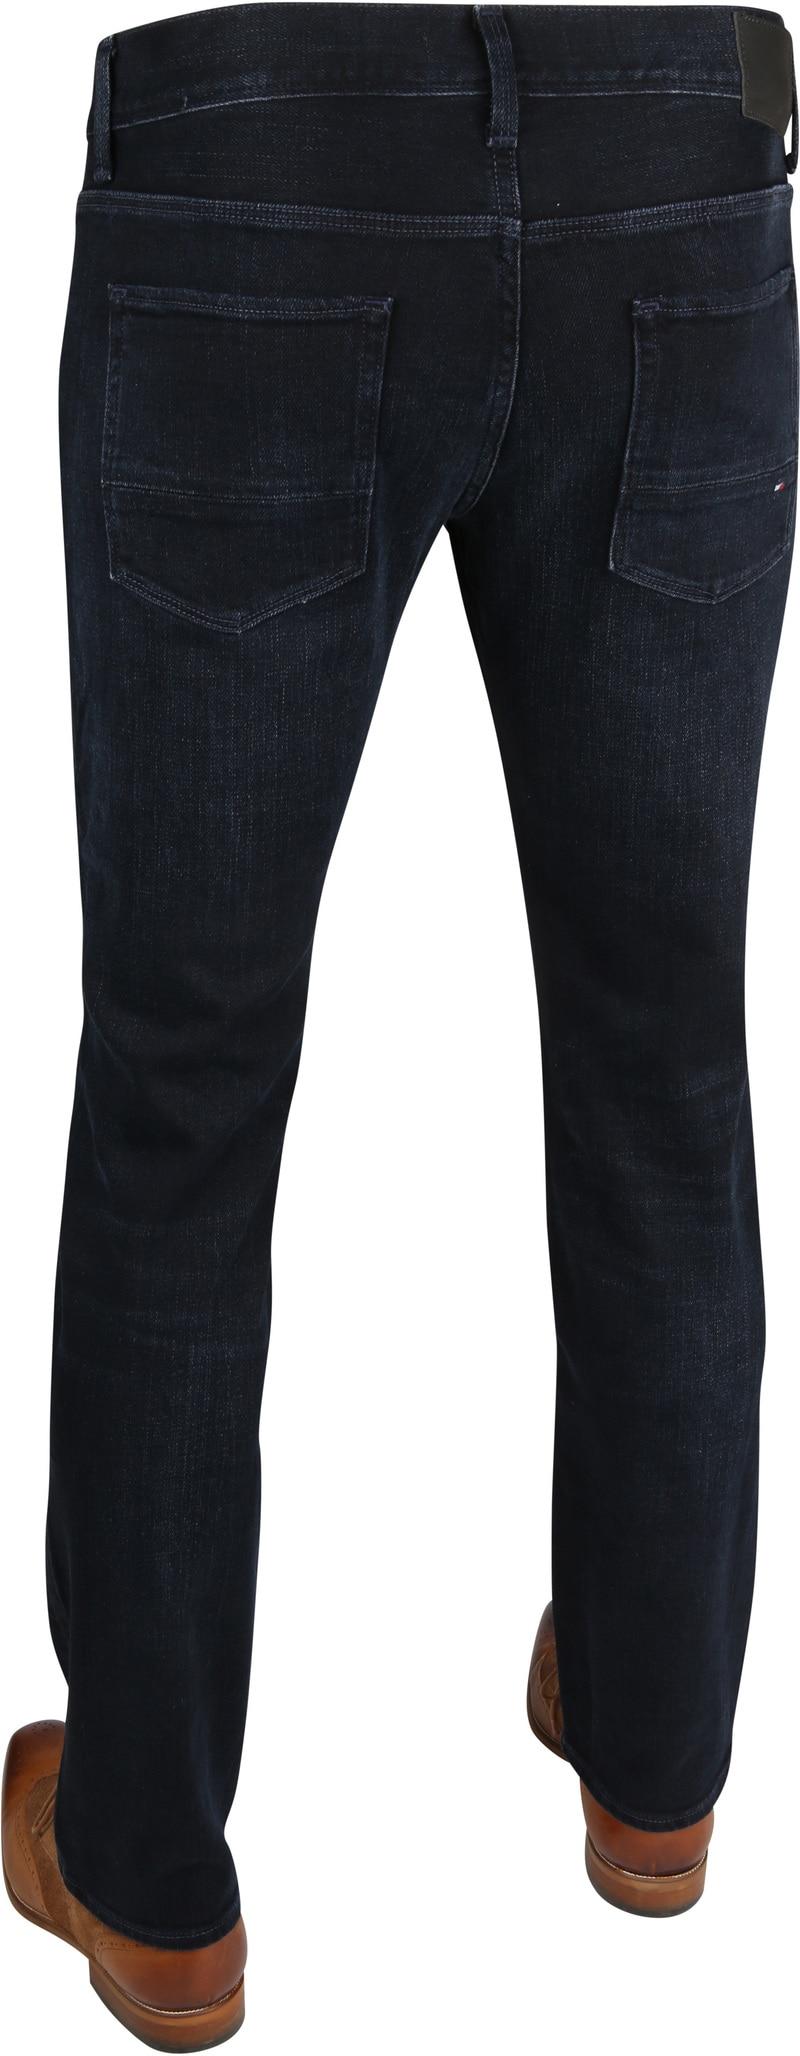 Tommy Hilfiger Core Denton Jeans Navy foto 2